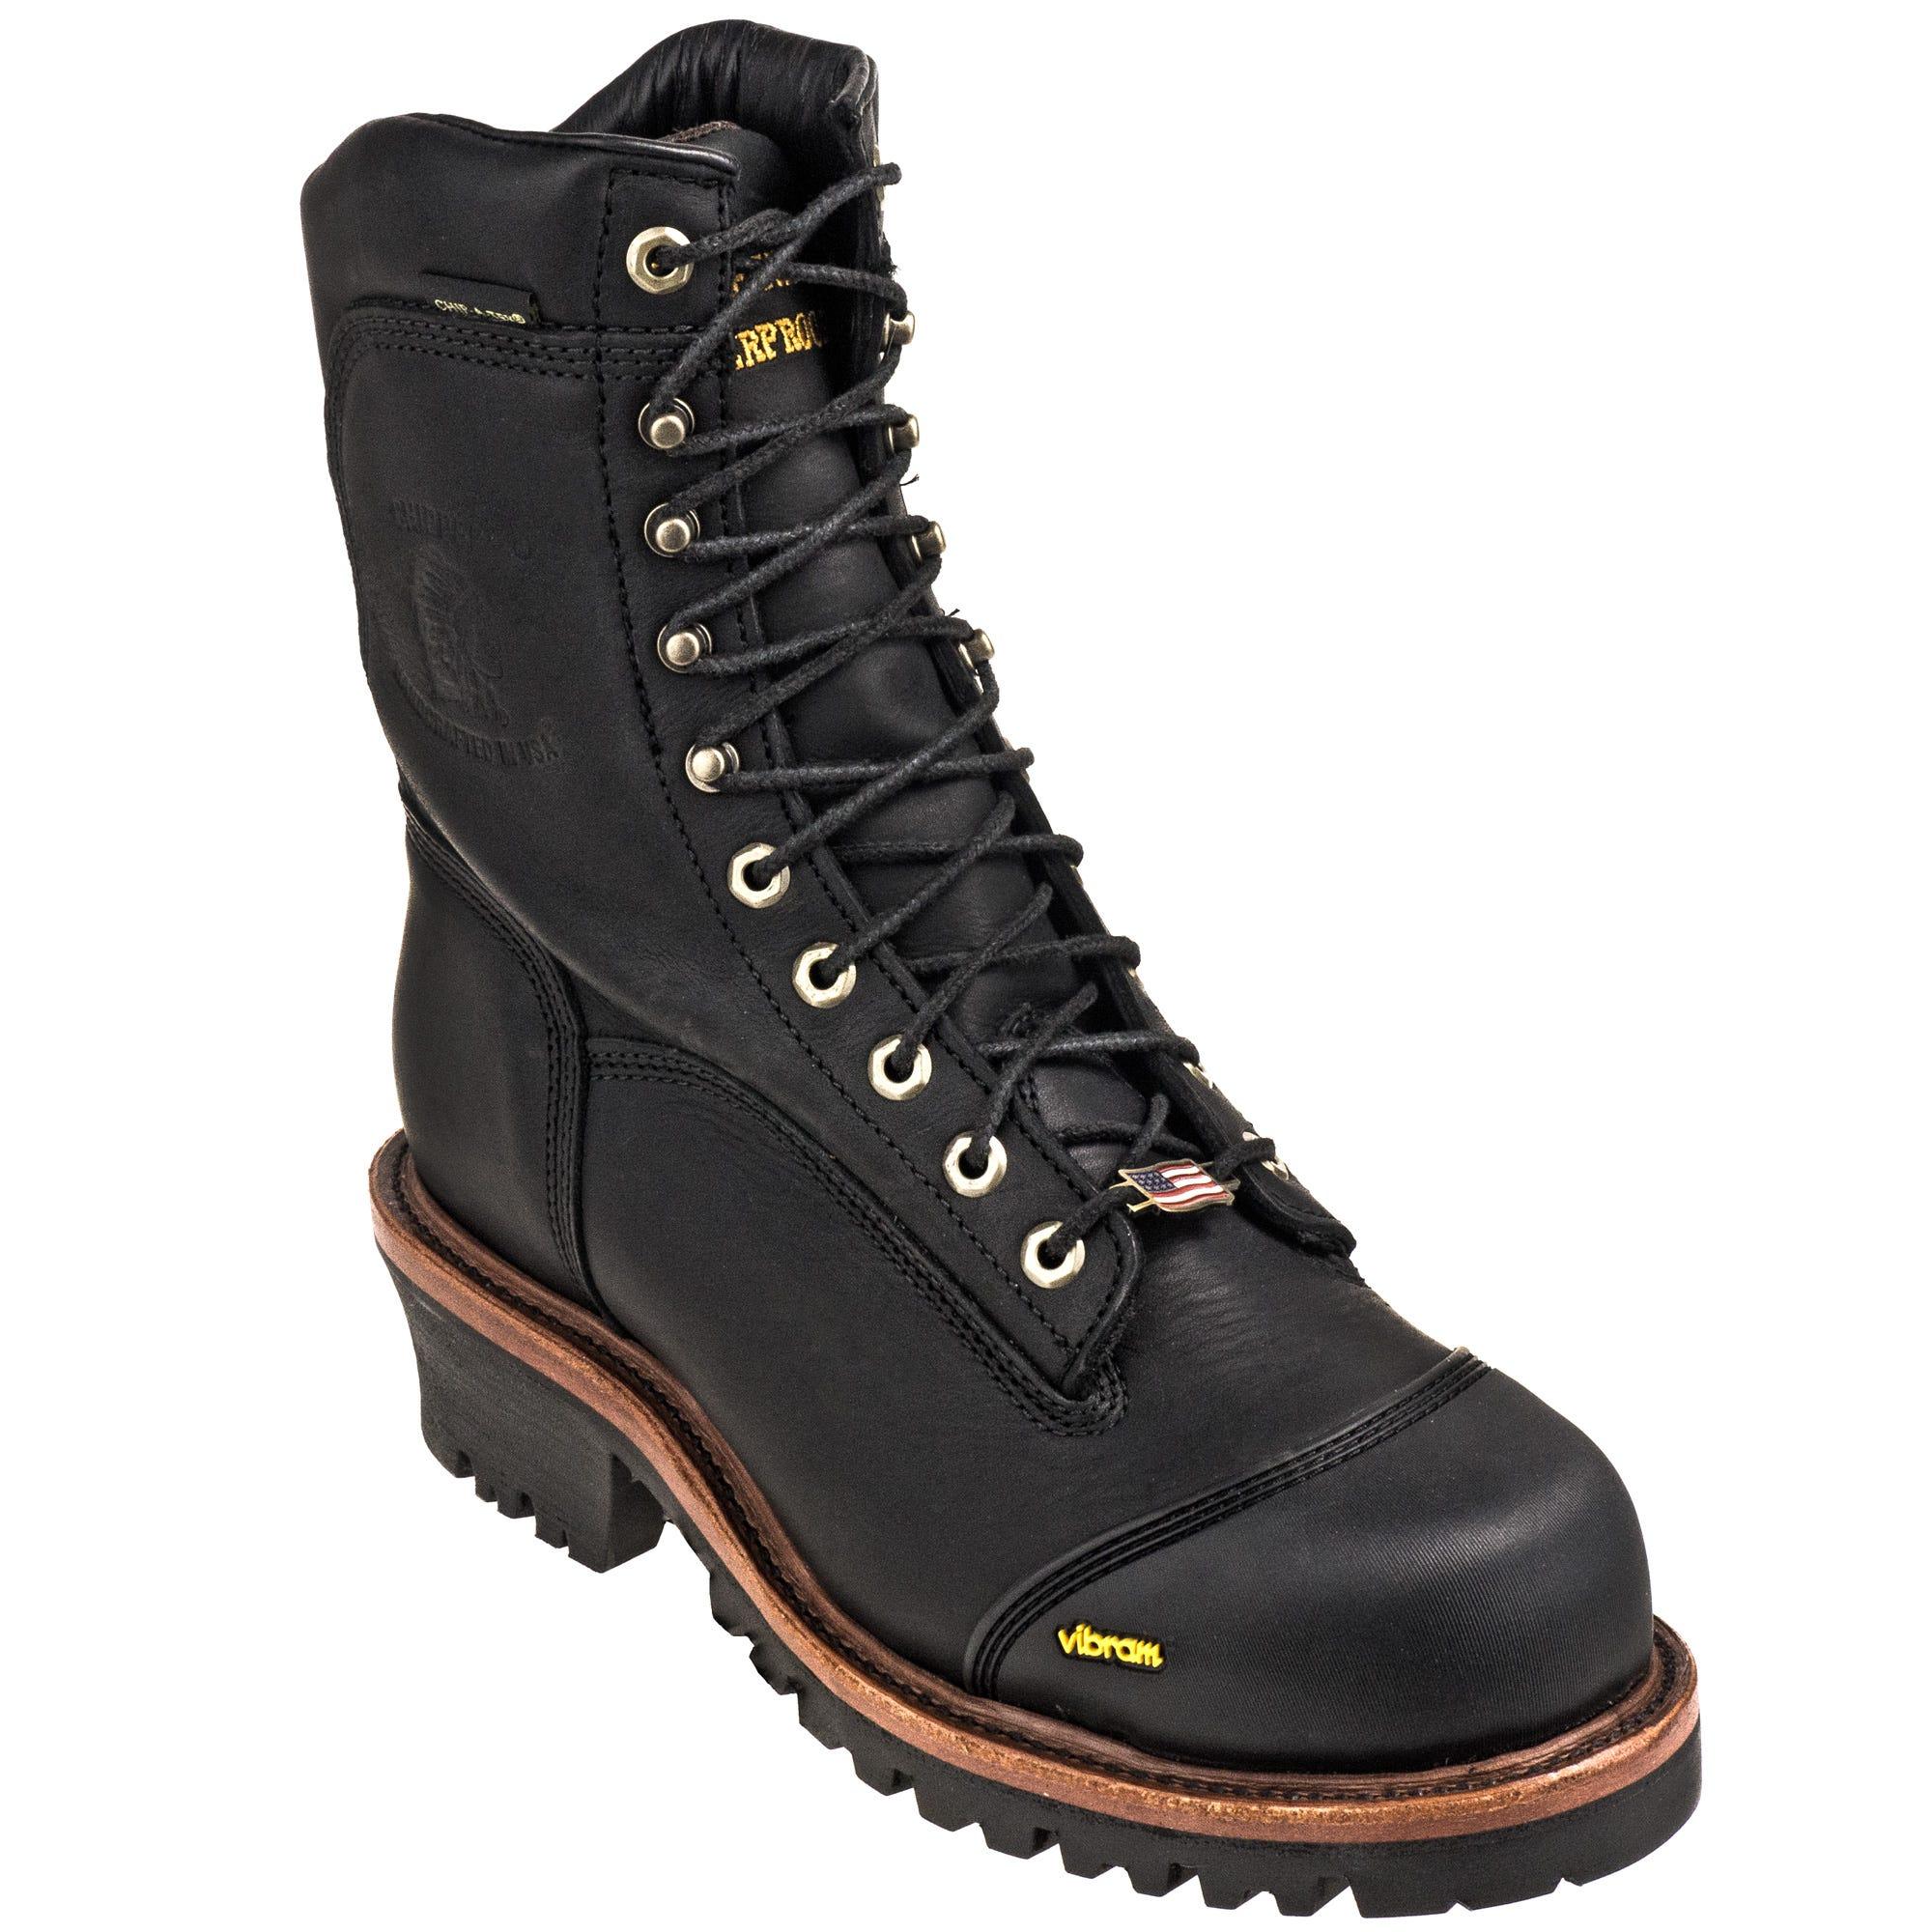 87328d31fdd Chippewa Boots: Men's 25380 Black Waterproof Composite Toe Super ...